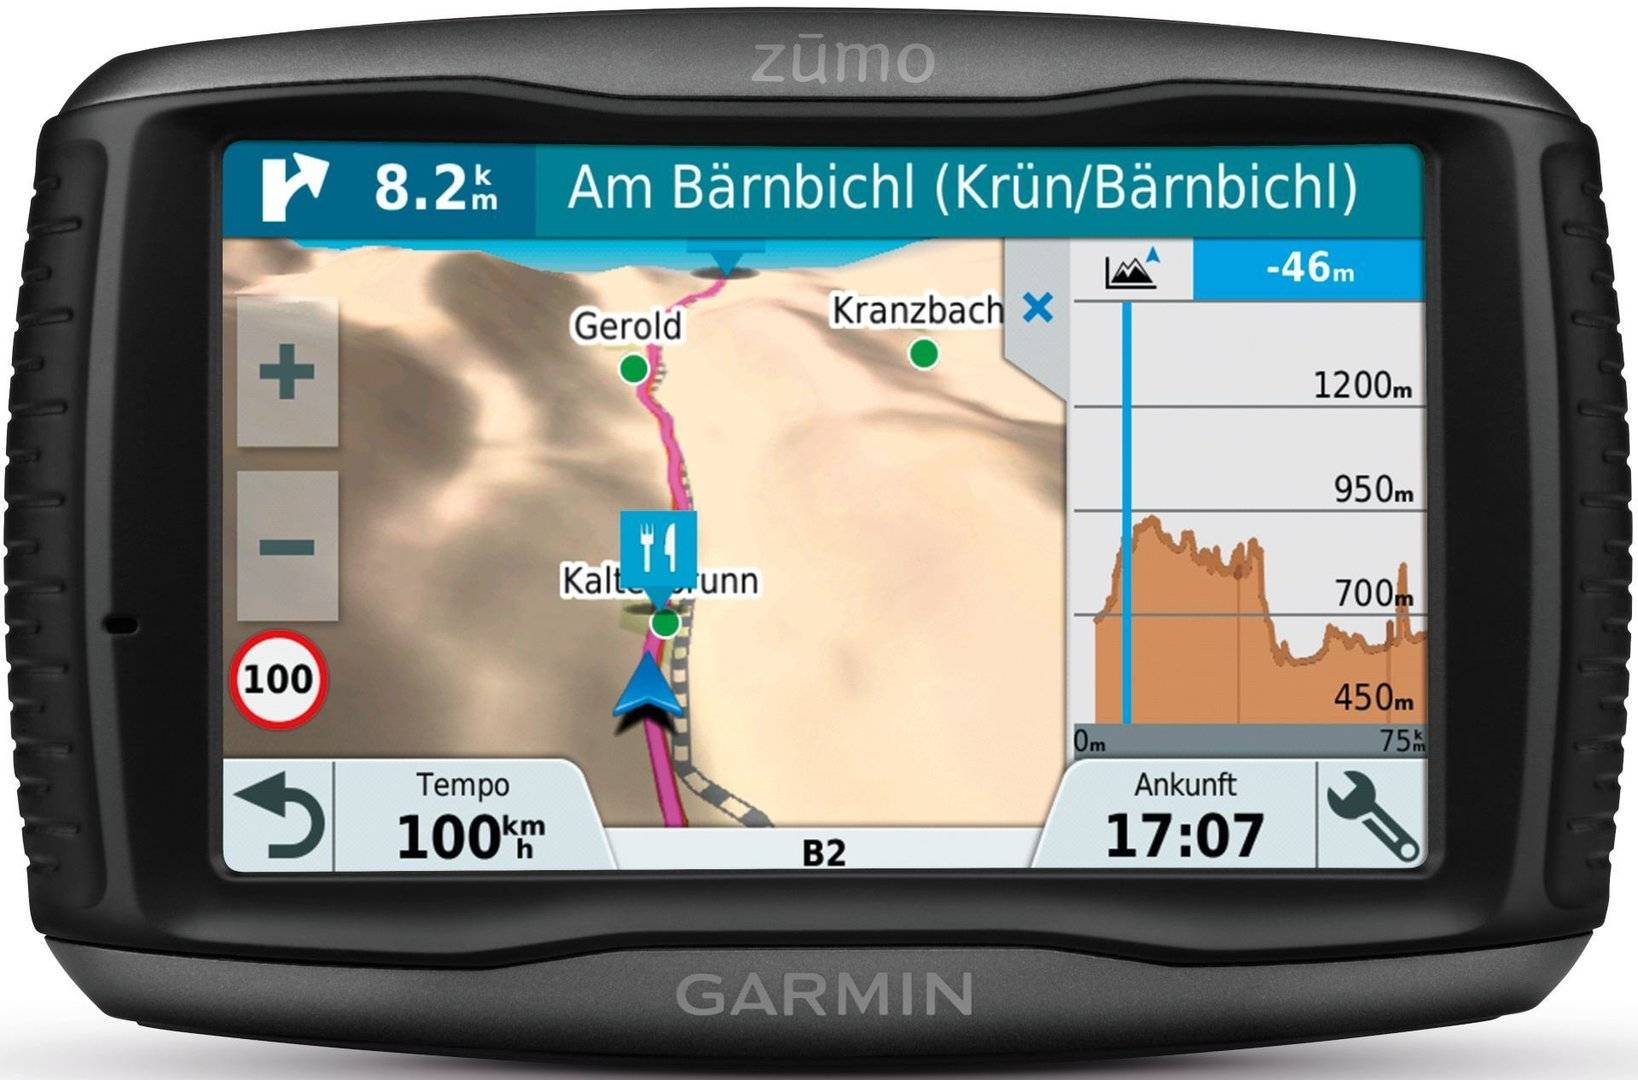 garmin zumo 595lm europe navigation system black one